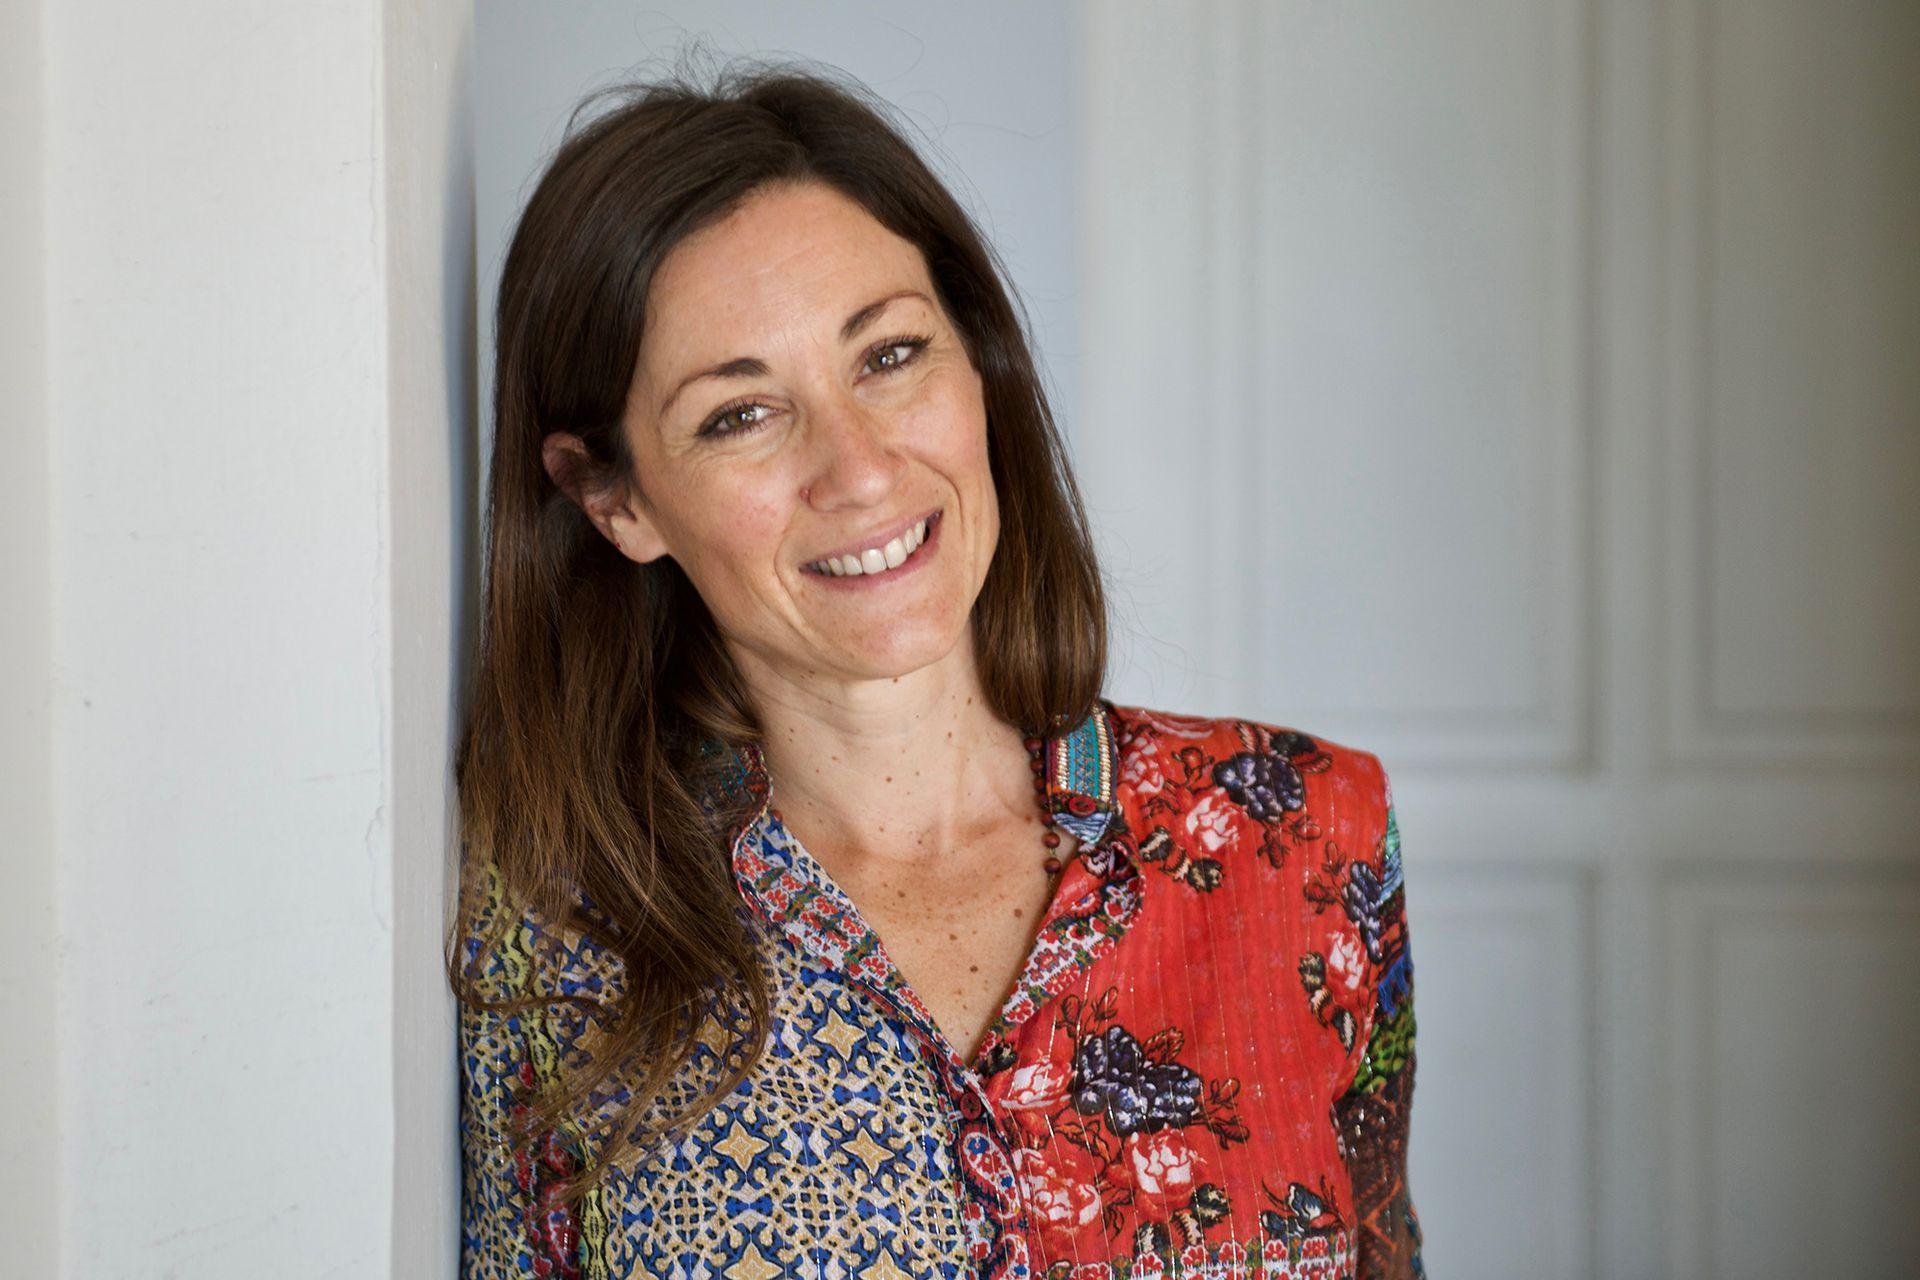 Pamela Alfonso, Mejor Viticultora 2021 según Tim Atkin